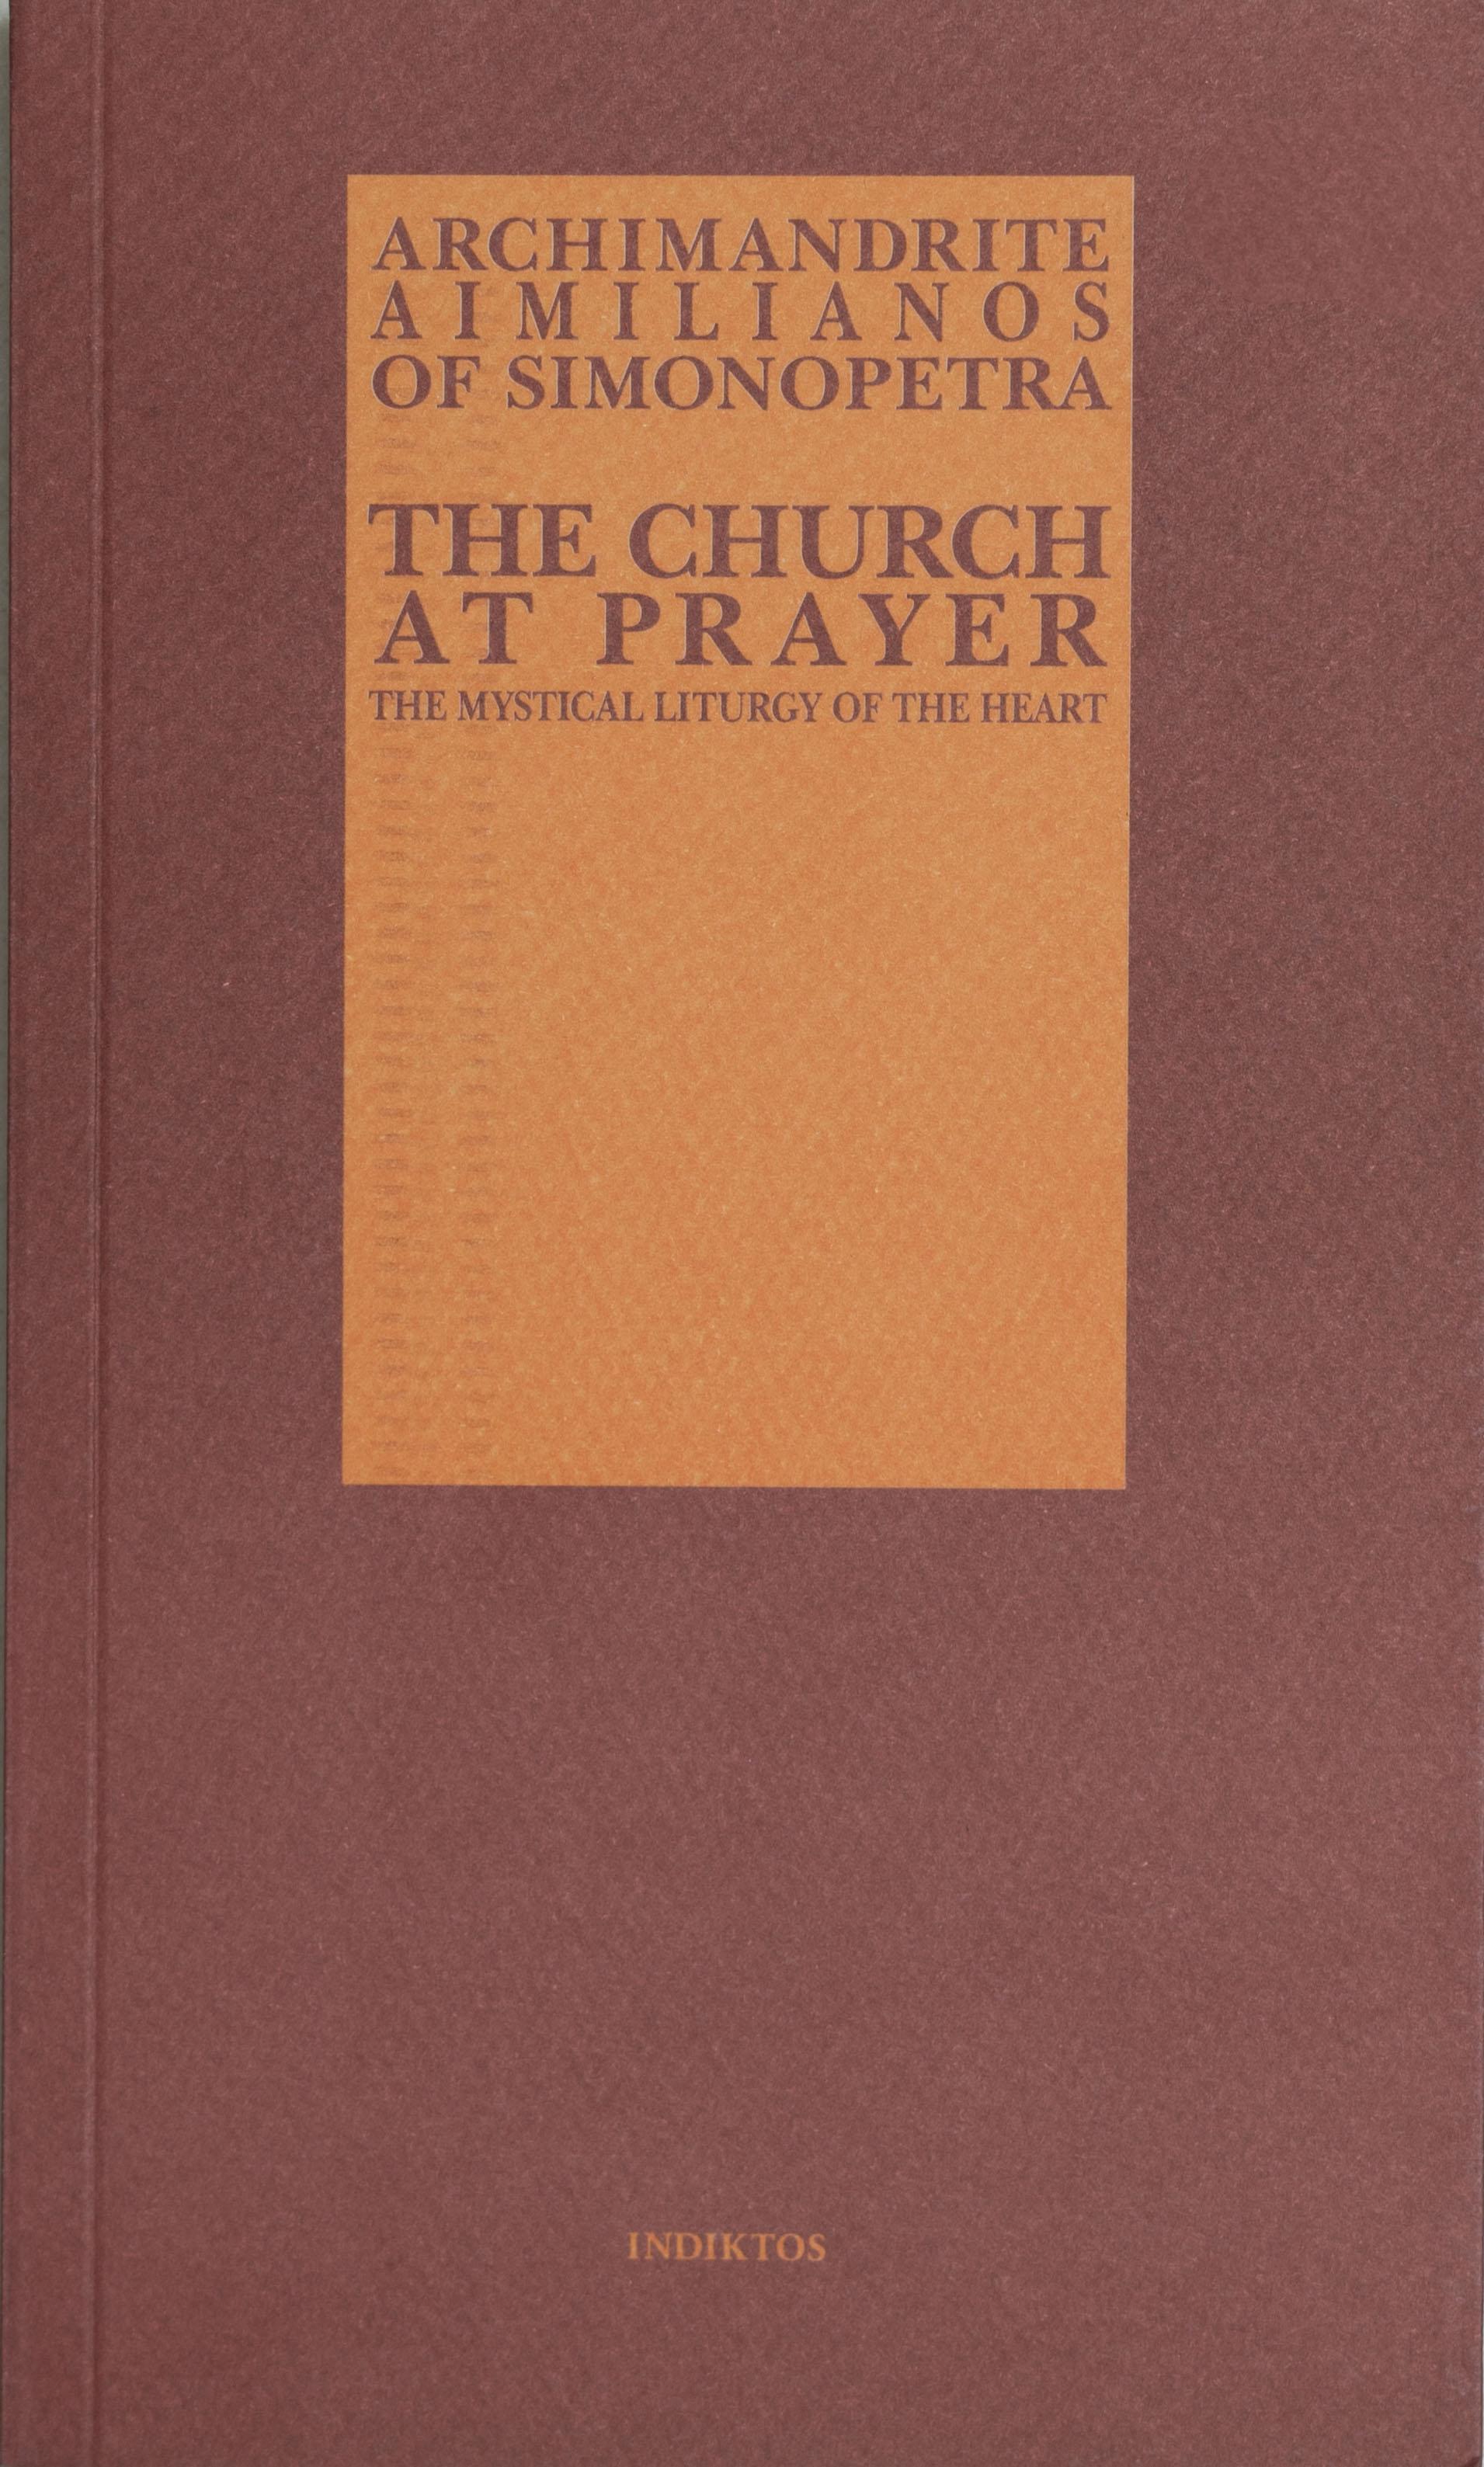 The Church at Prayer: The Mystical Liturgy of the Heart